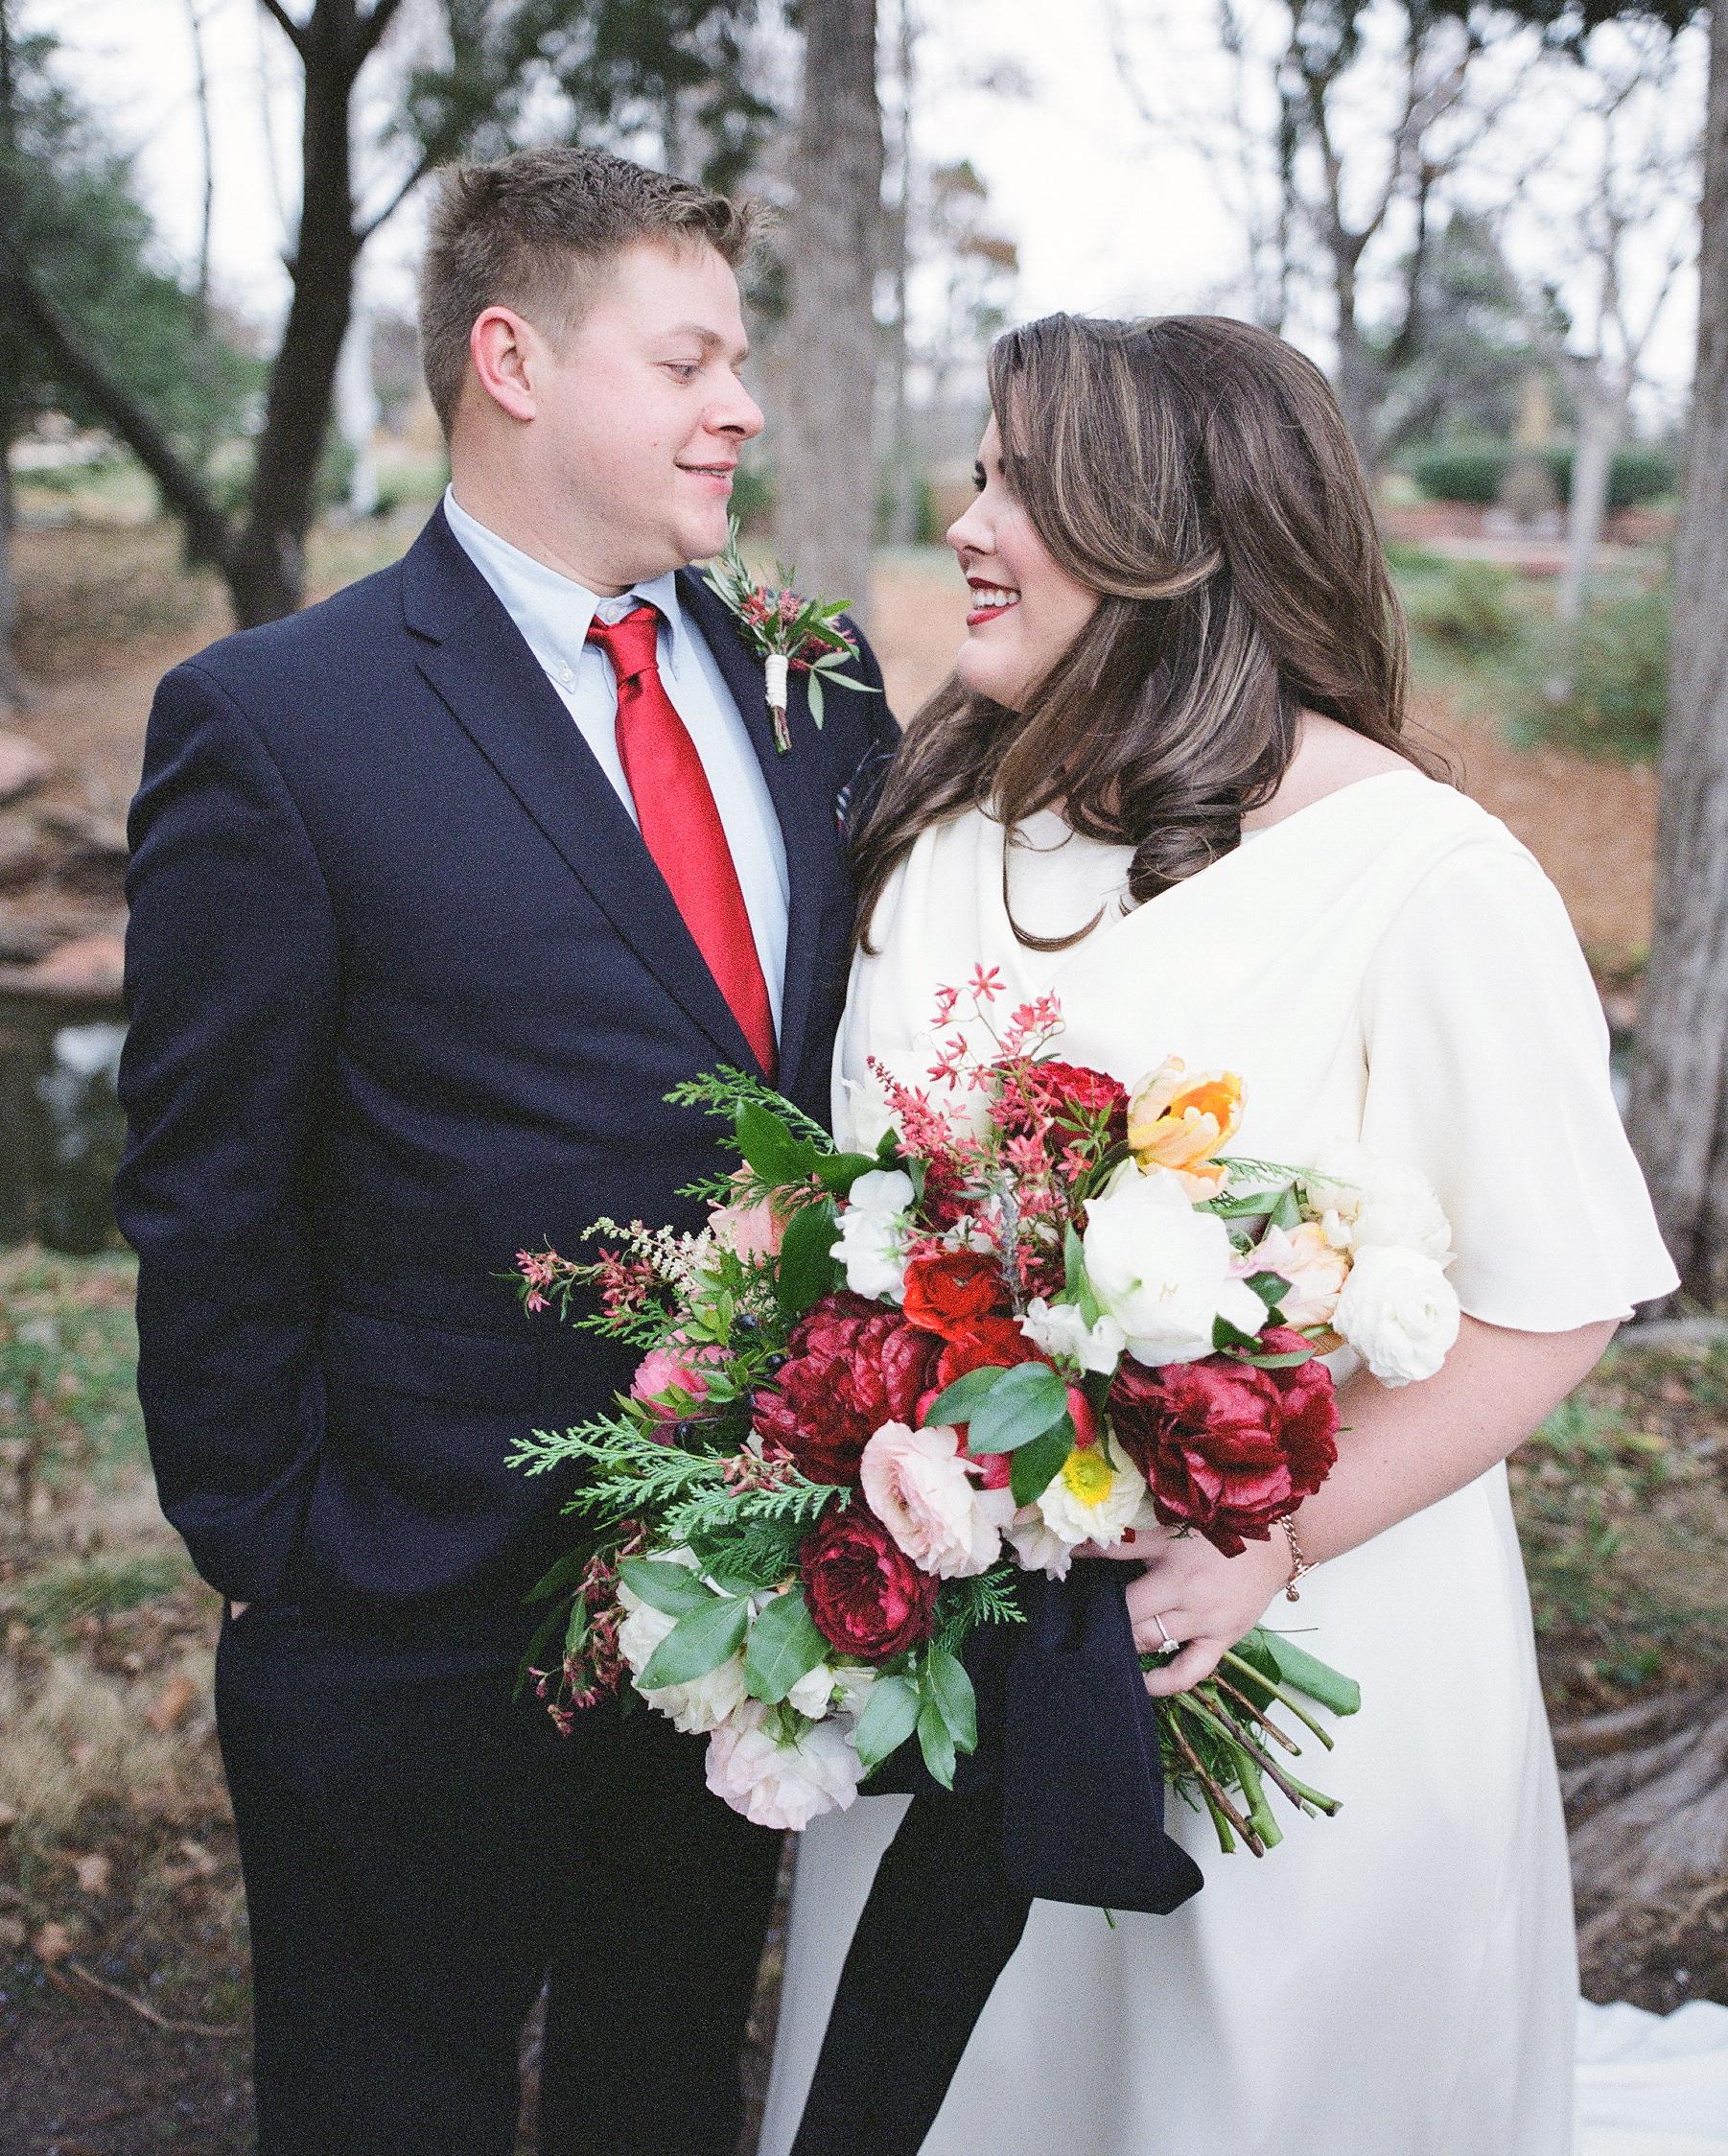 jessie-justin-wedding-couple-6-s112135-0915.jpg